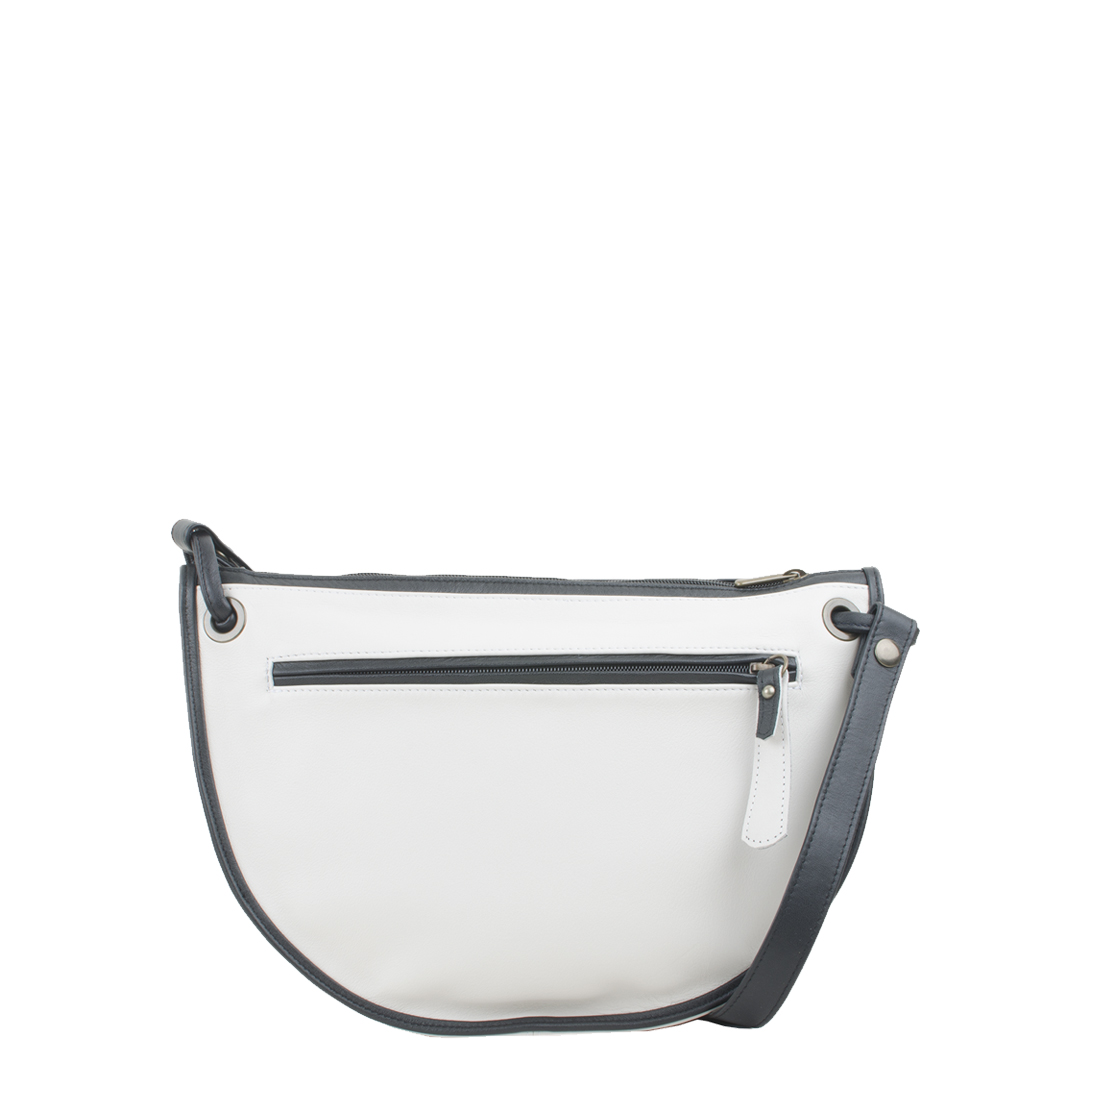 Rachel Polvere Leather Across Body Bag